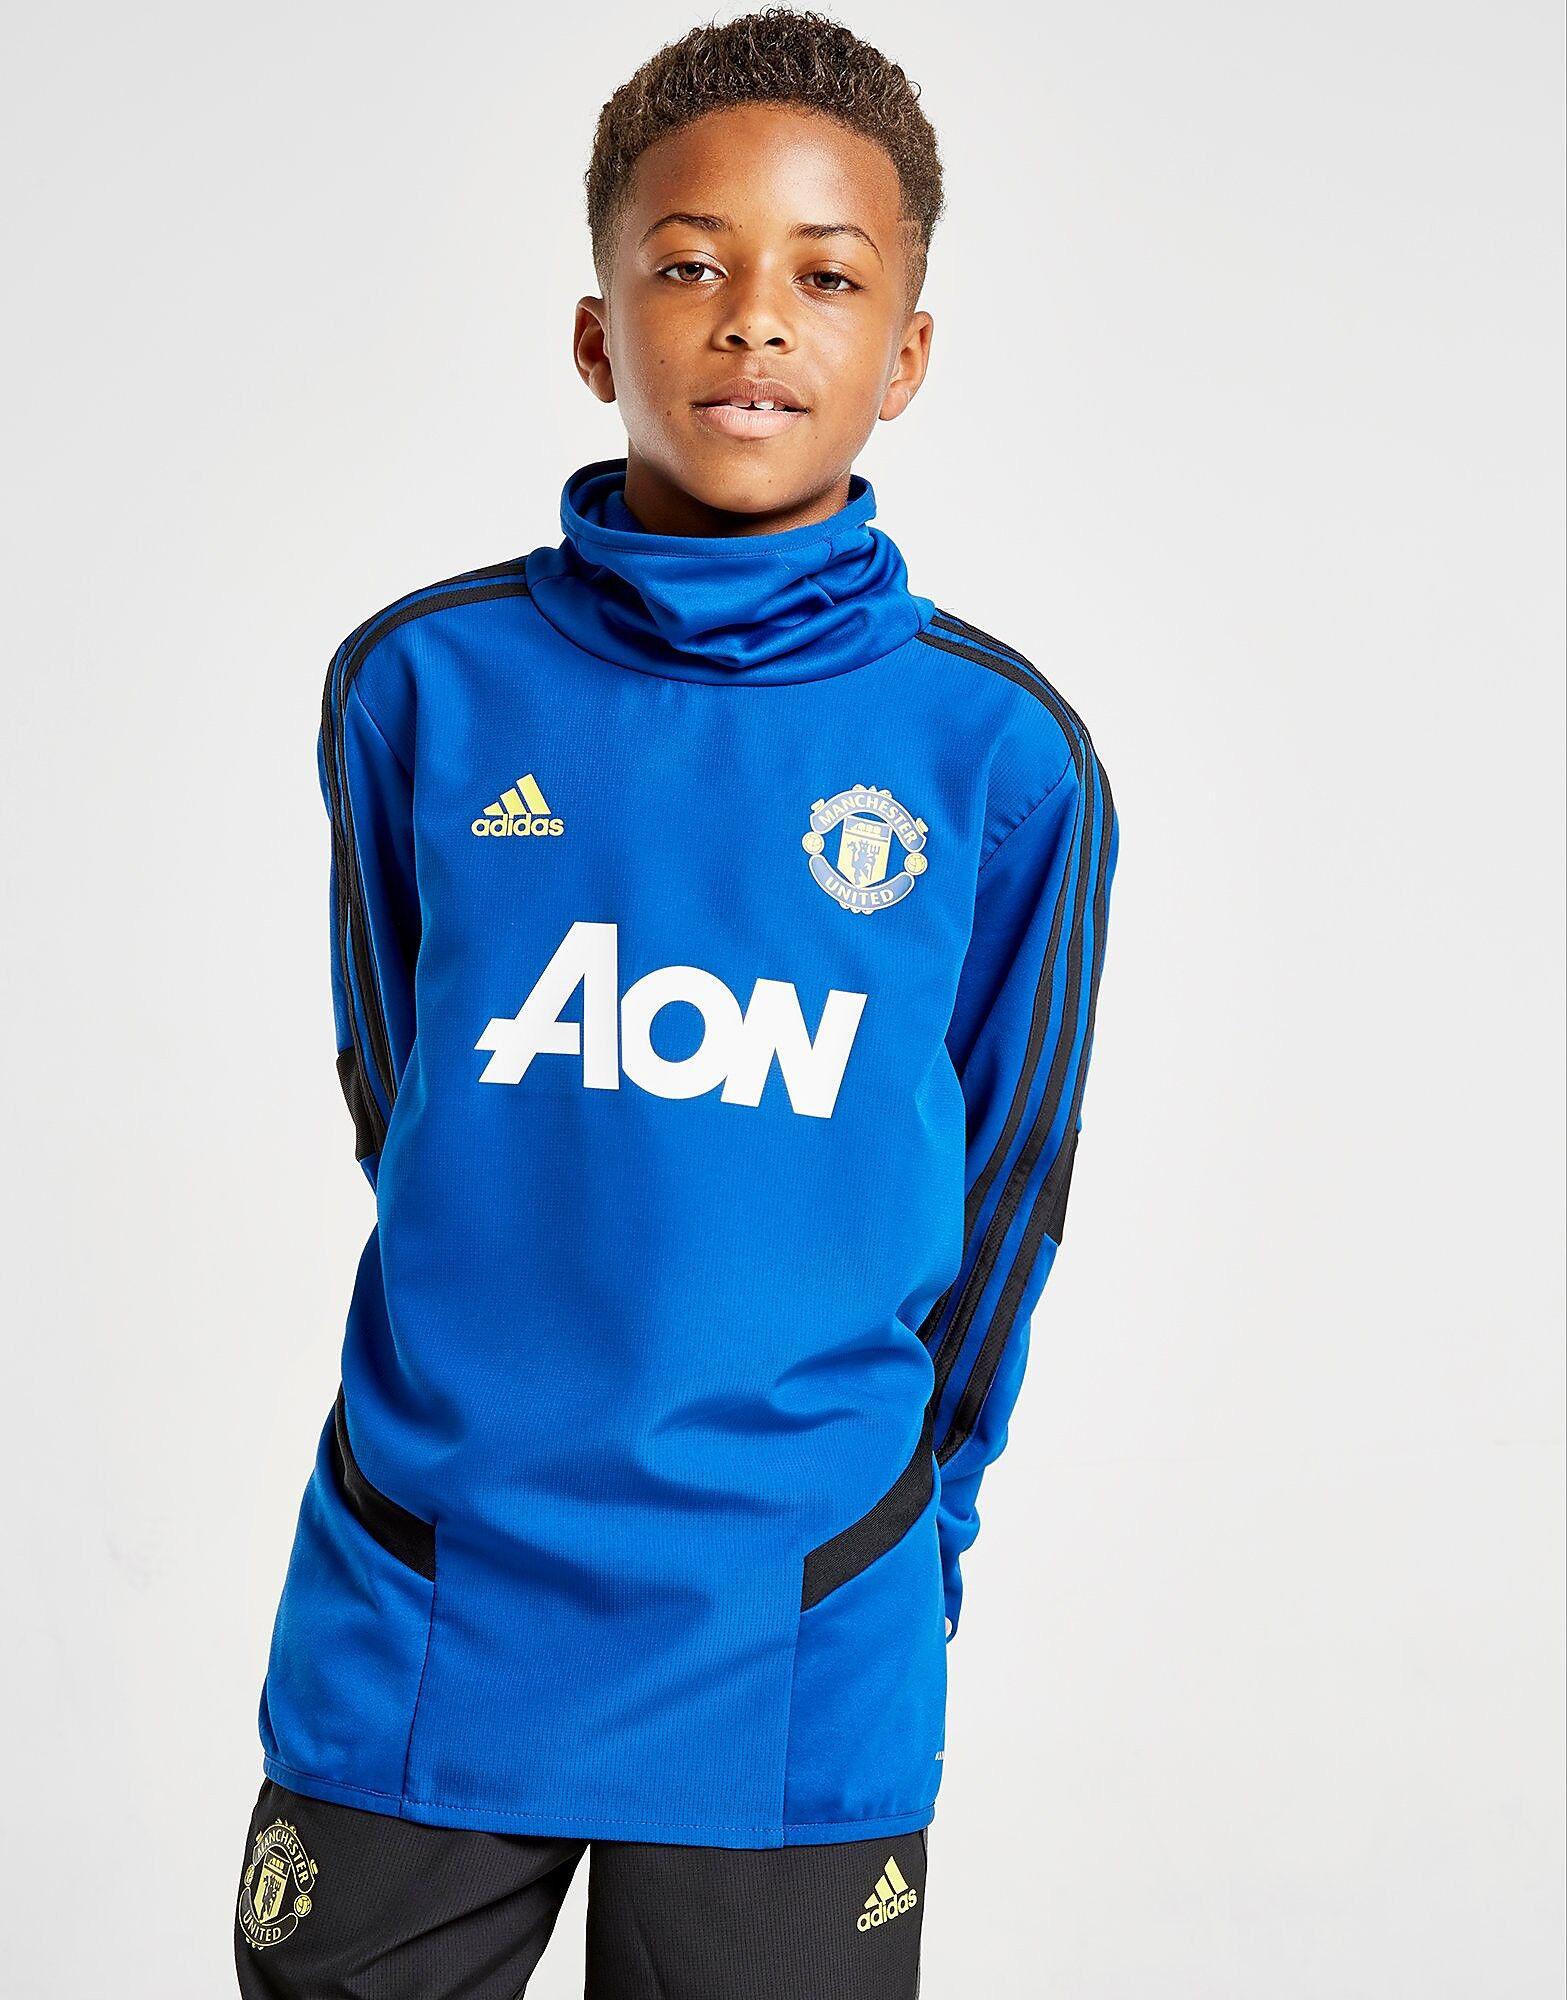 Image of Adidas Manchester United FC Lämpöpaita Juniorit - Kids, Sininen